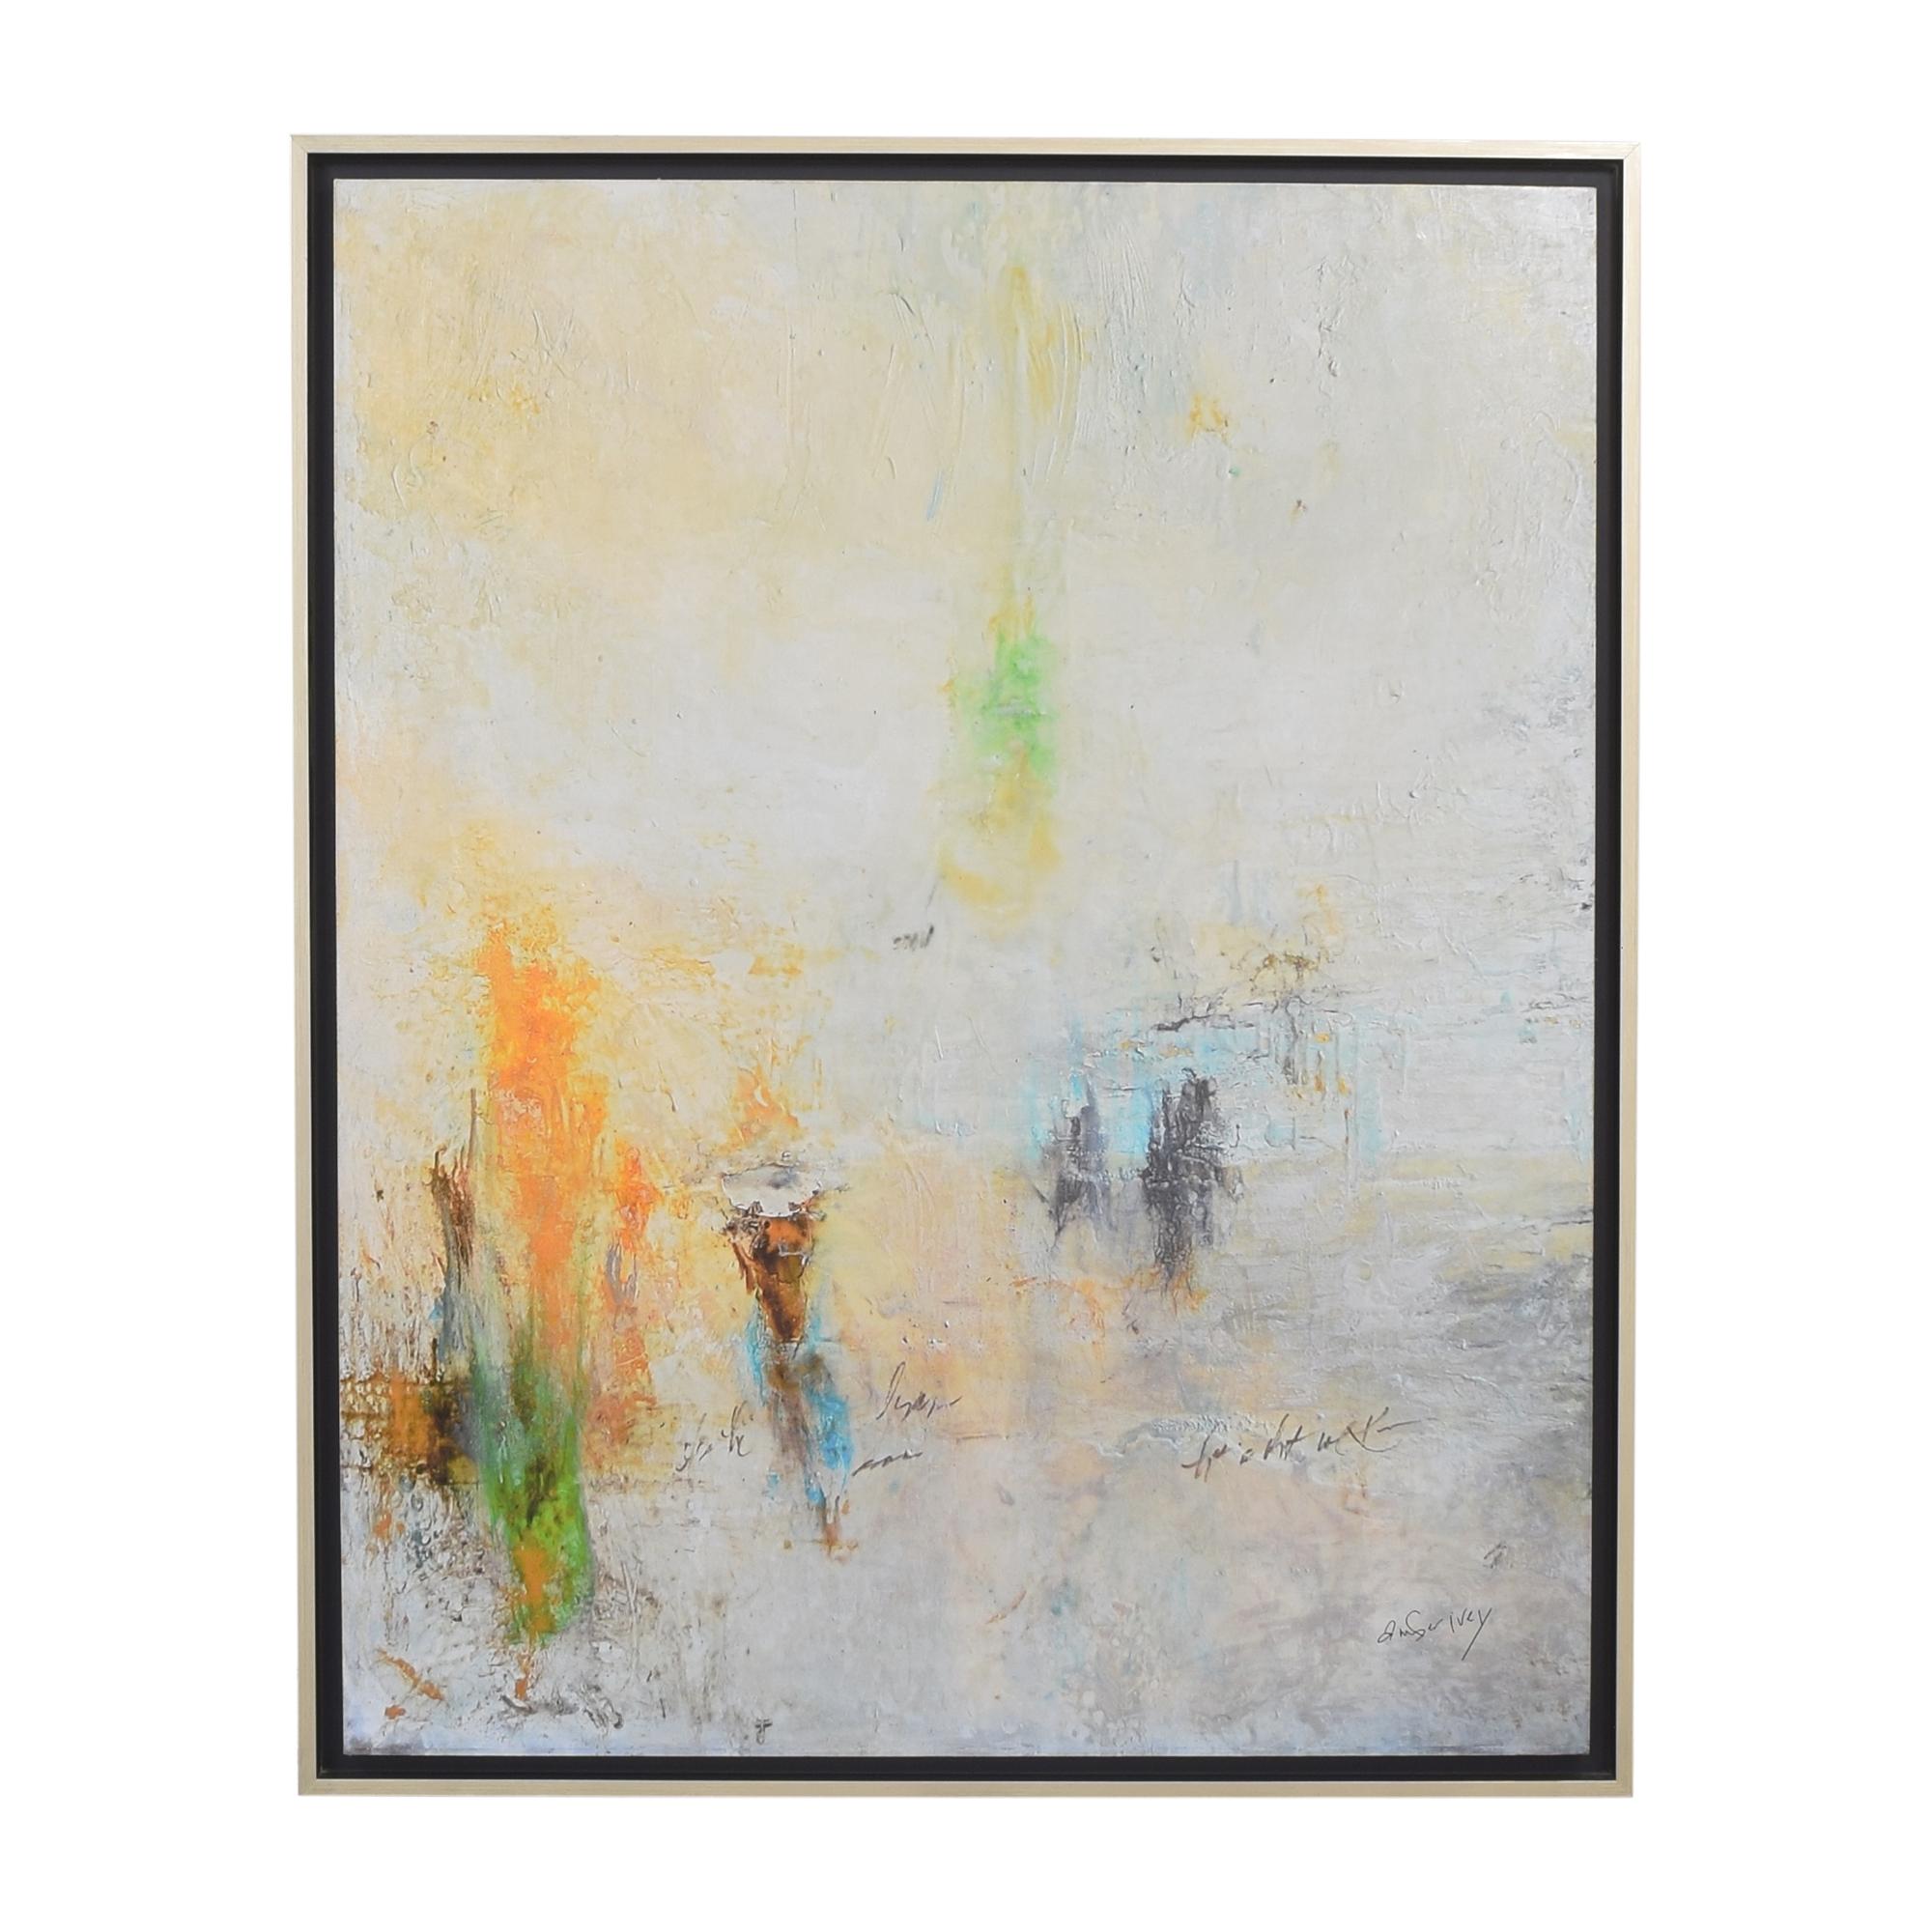 John-Richard John-Richard Amber Ivey's Soft Light Wall Art price